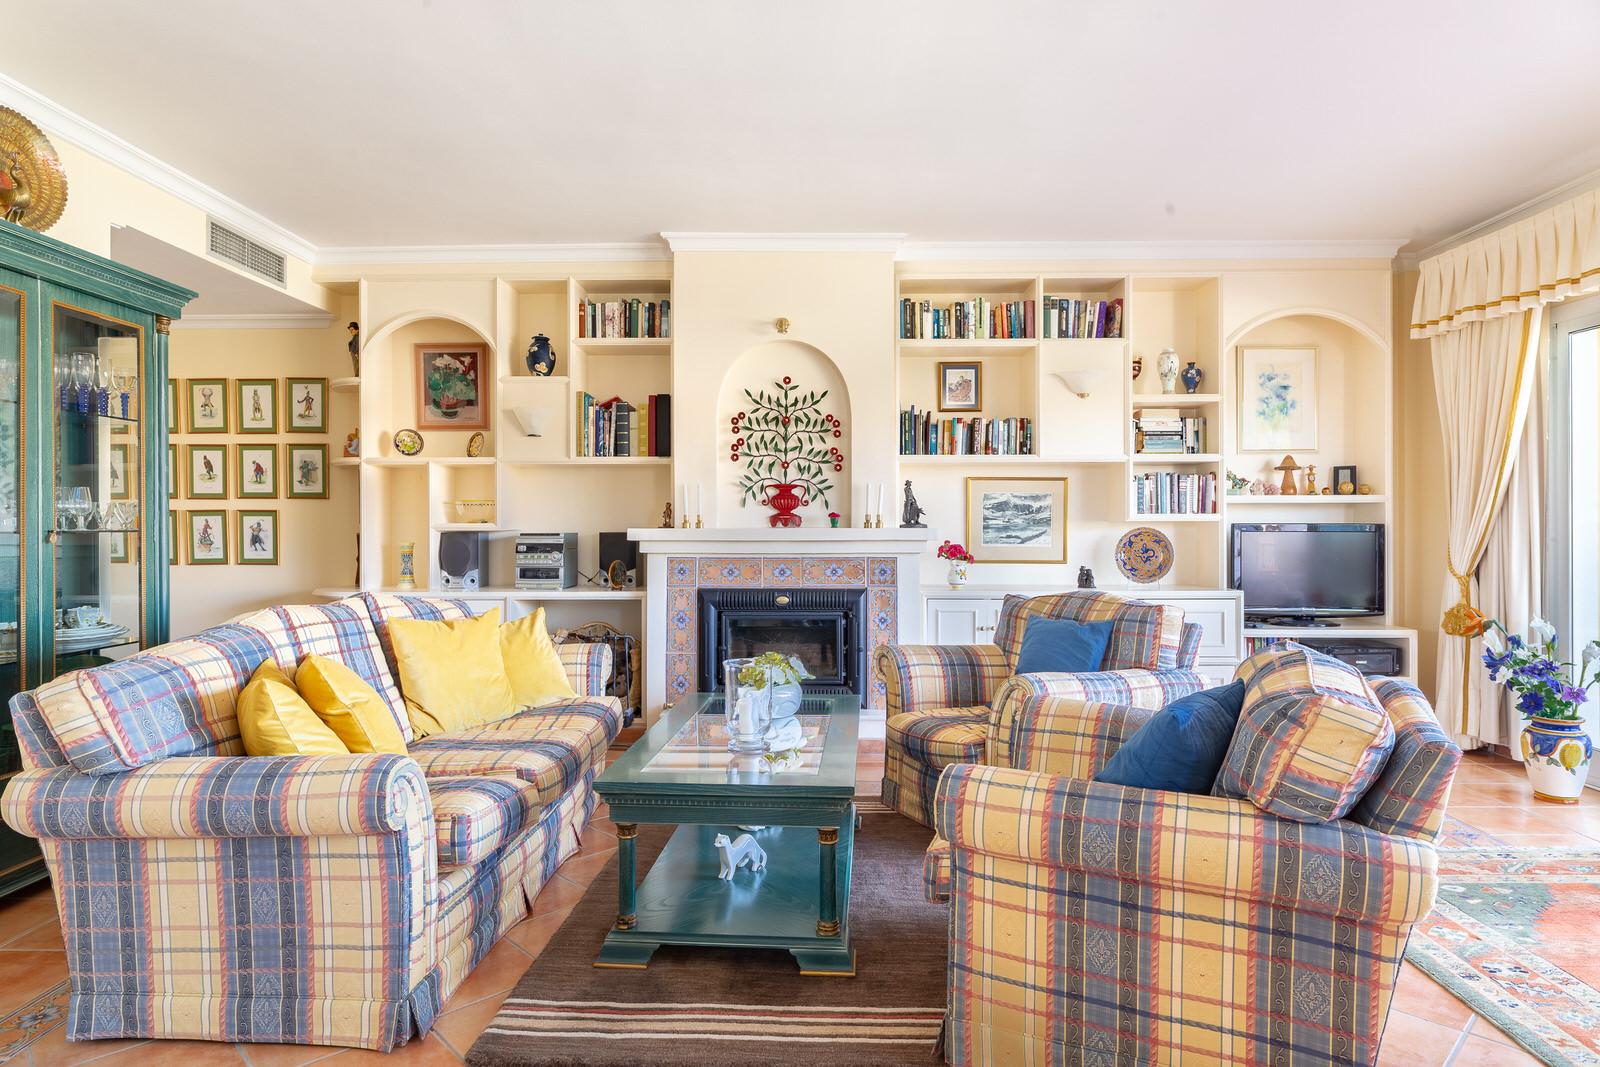 real estate photography mijas penthouse property luxury house photographer interiors - Inmobiliaria & interiores - 🥇 Fotografia Marbella y Costa del Sol inmobiliaria, interiores